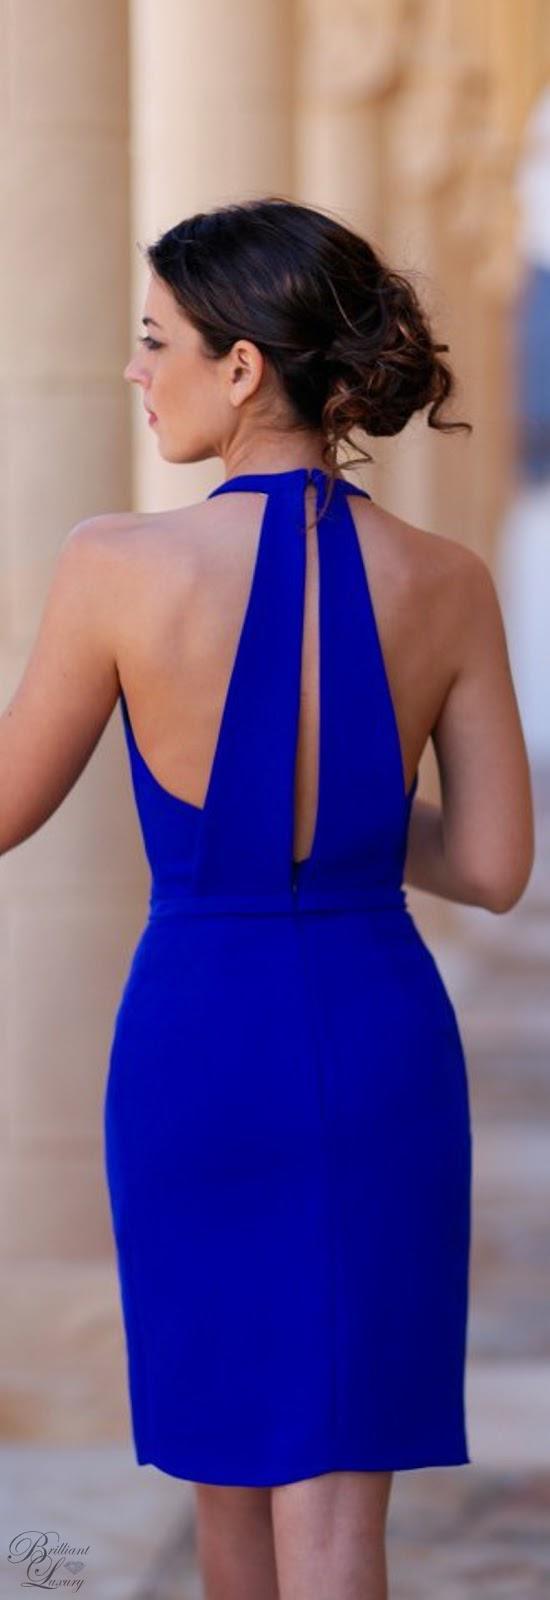 Brilliant Luxury ♦ Silvia Navarro blue Mare dress